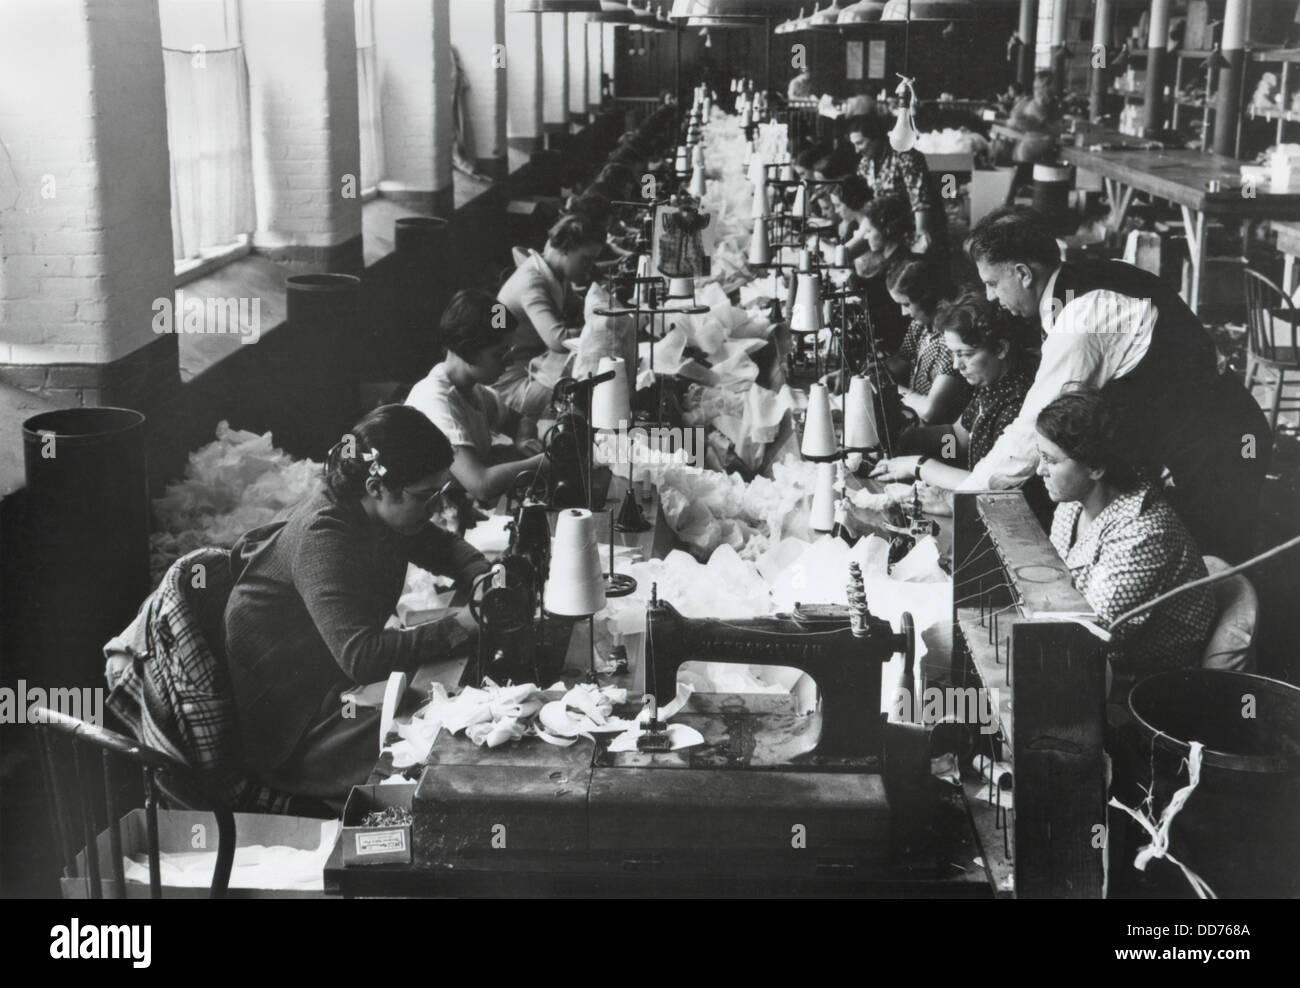 Women Sewing History Stockfotos & Women Sewing History Bilder - Alamy